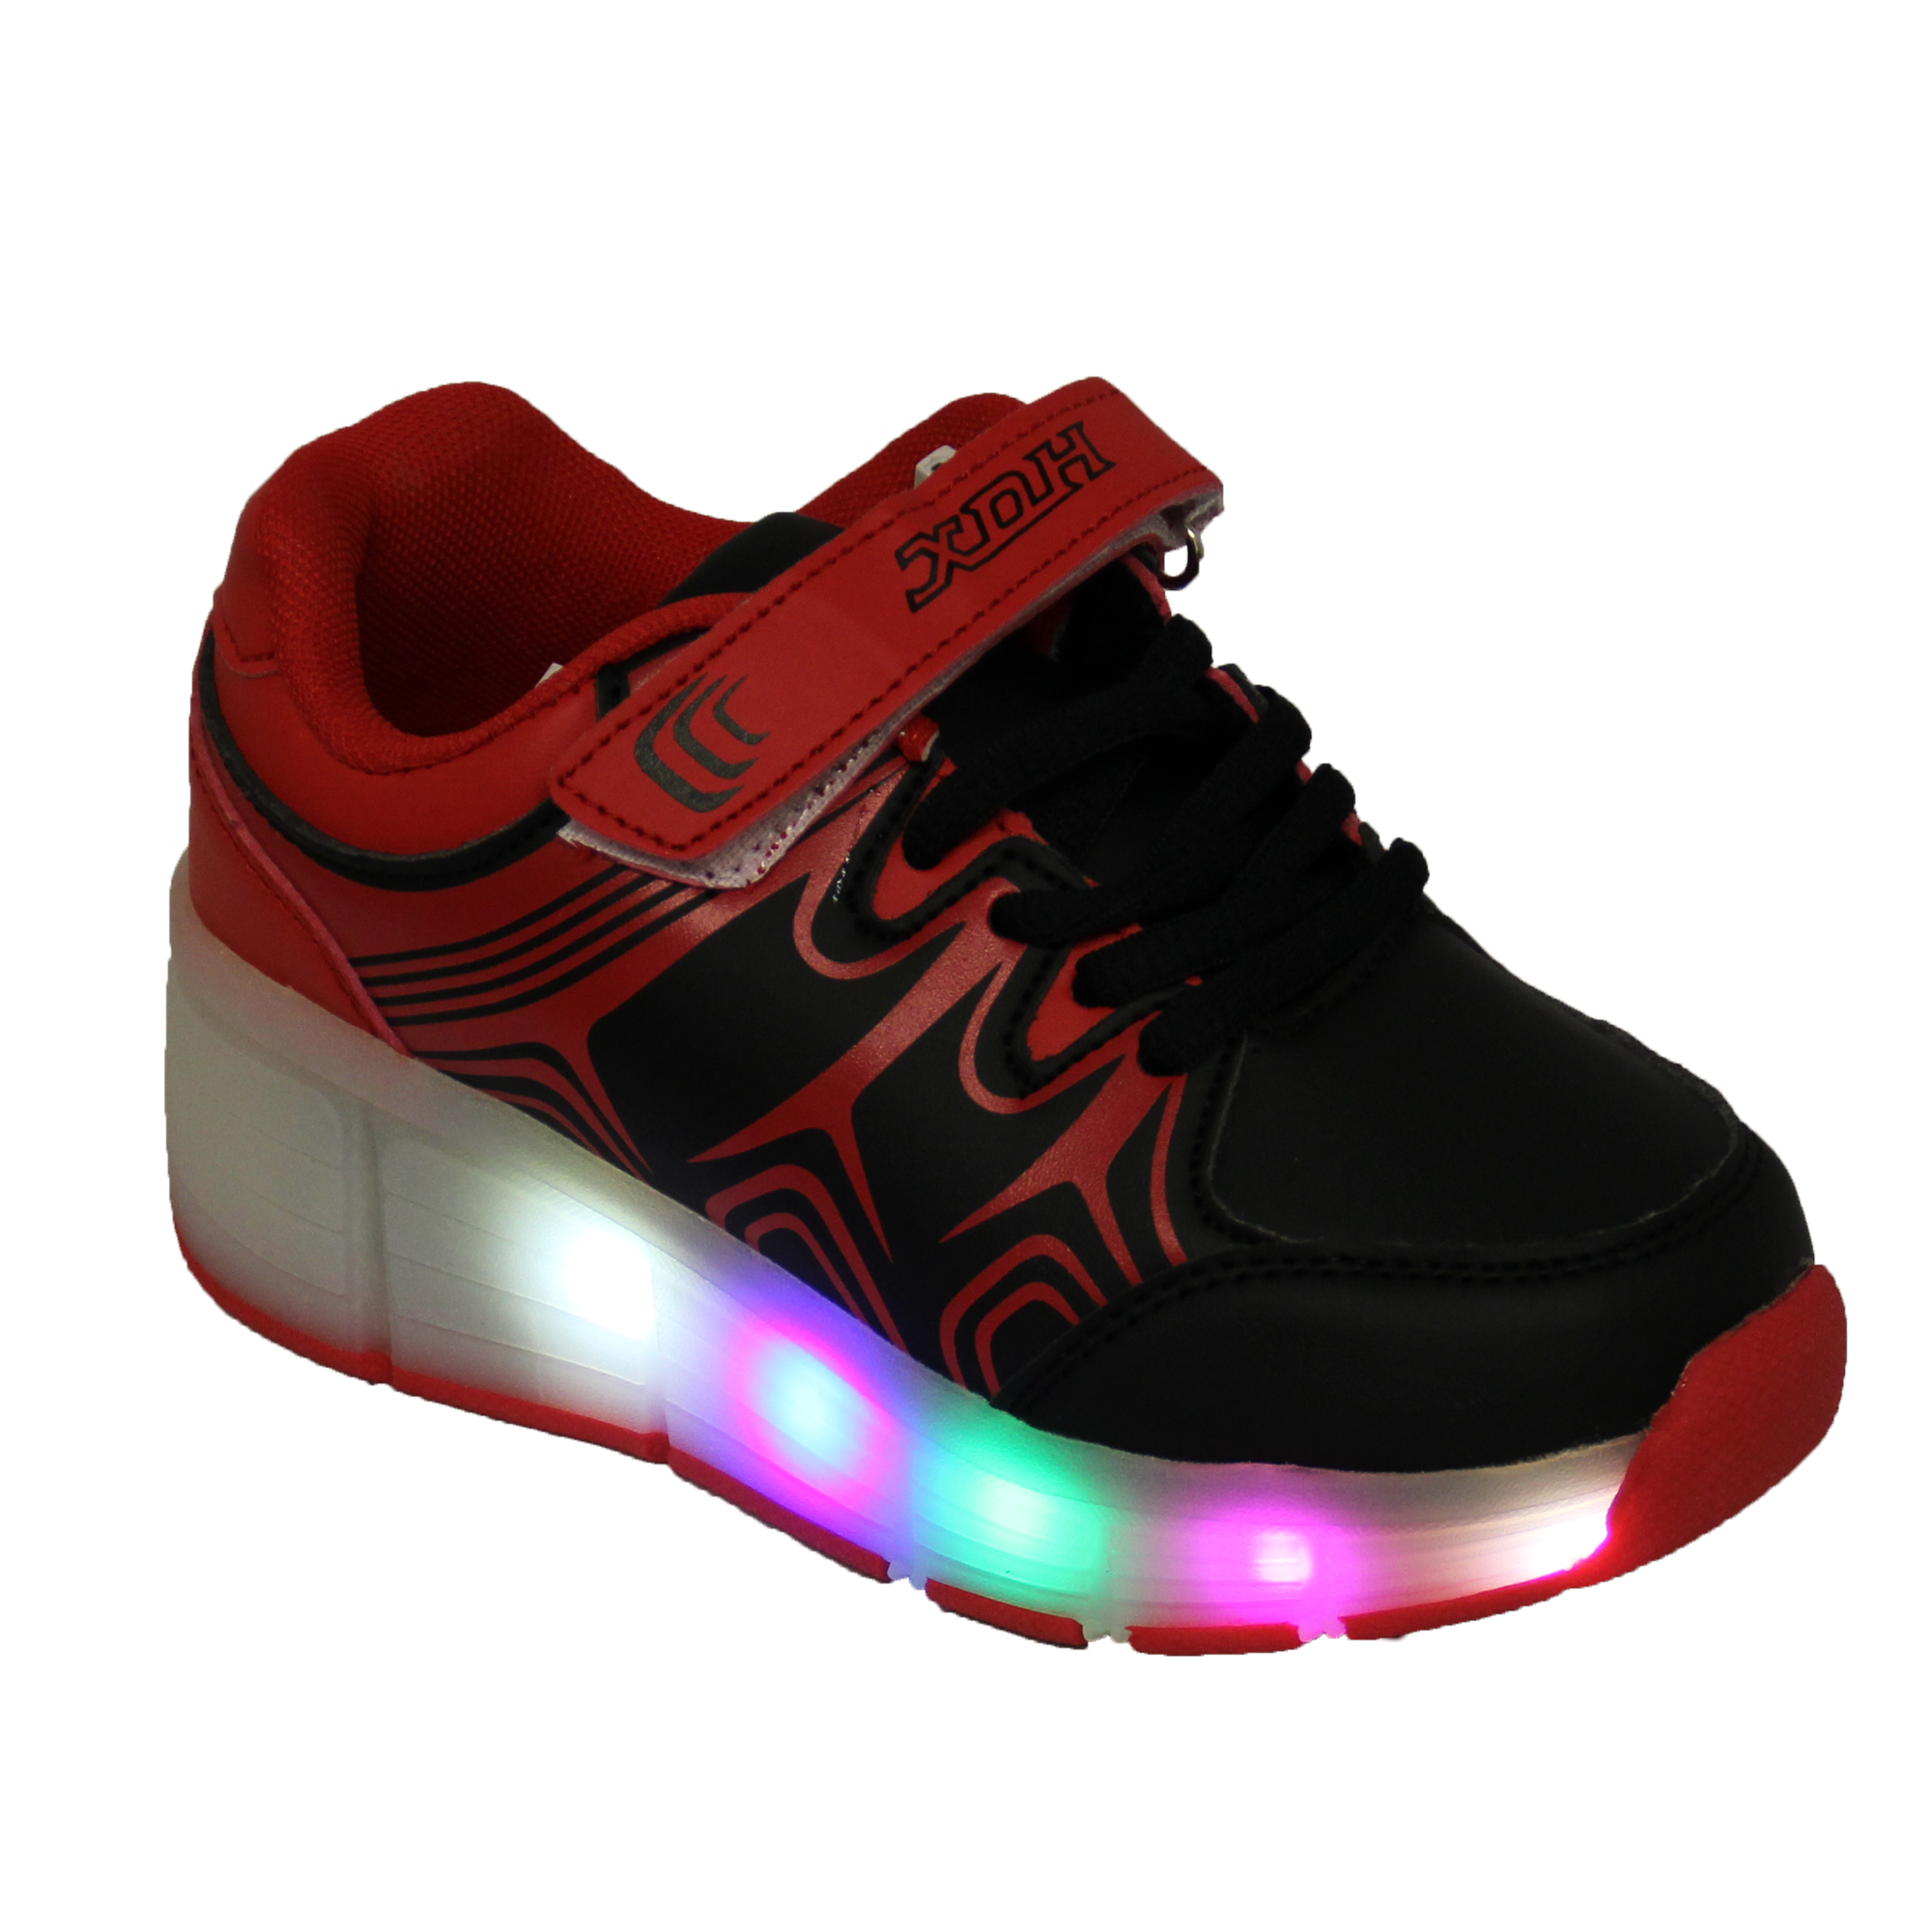 Retractable Roller Shoes Uk